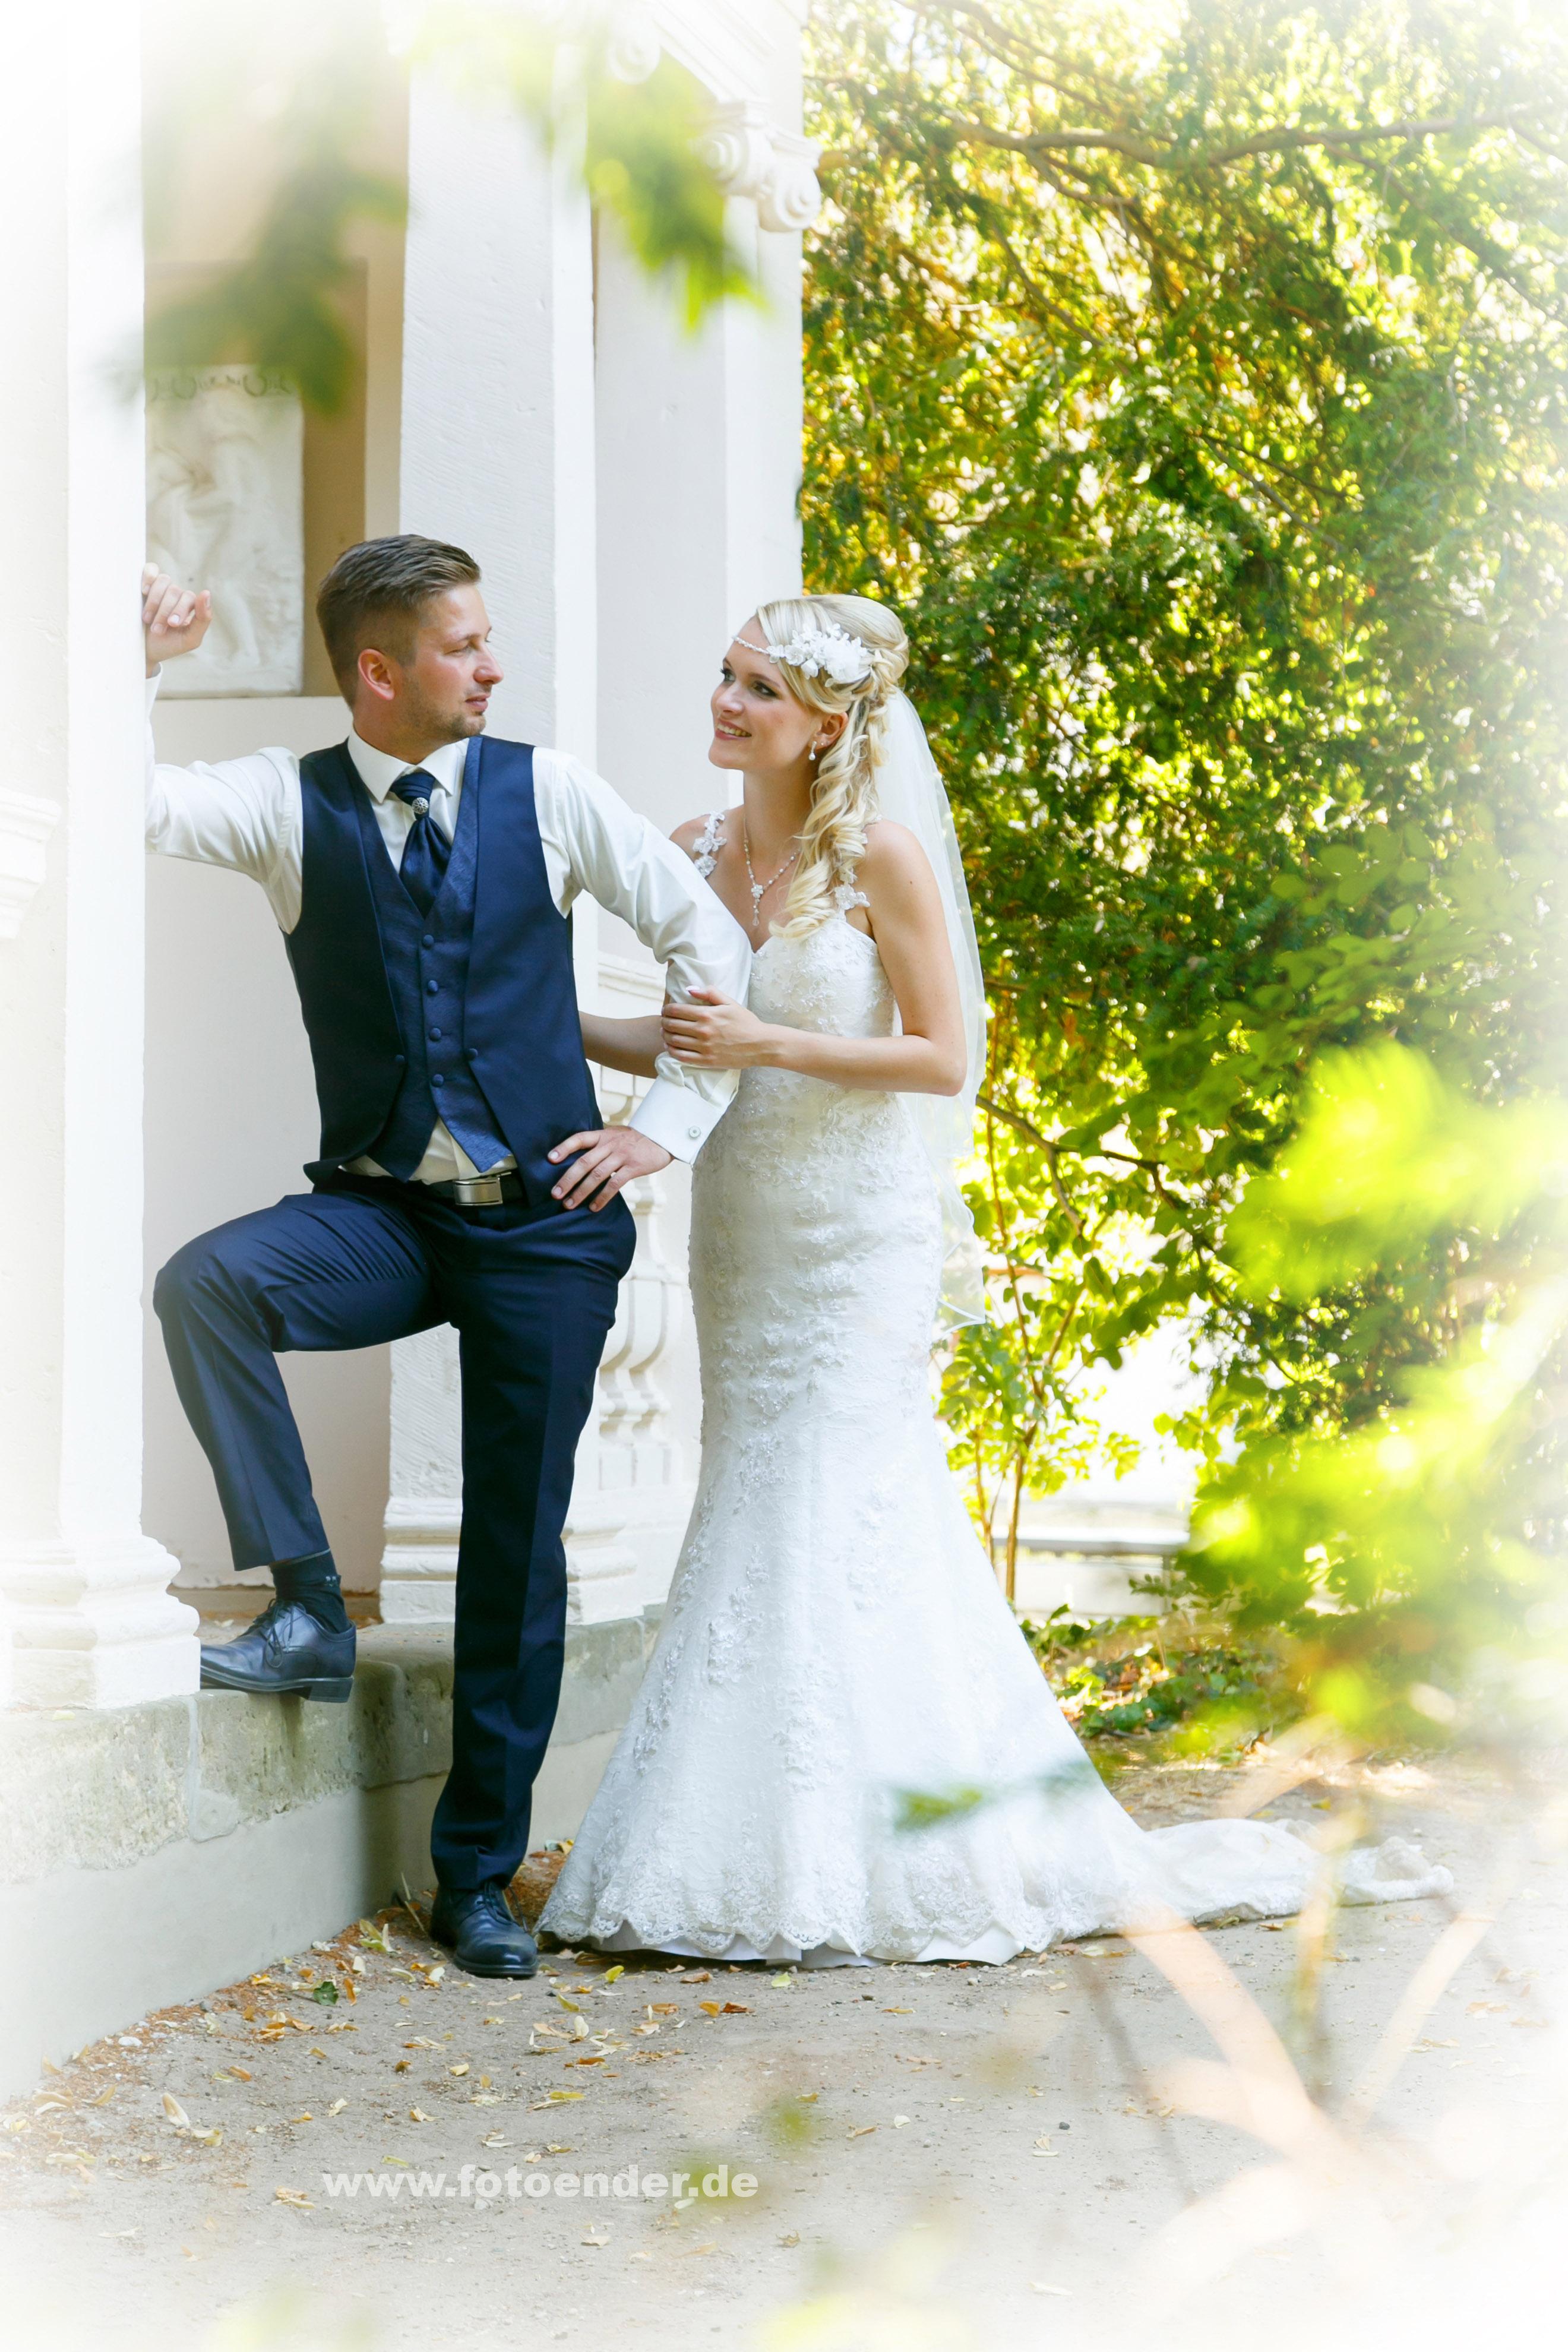 Heiraten in Oranienbaum-Wörlitz